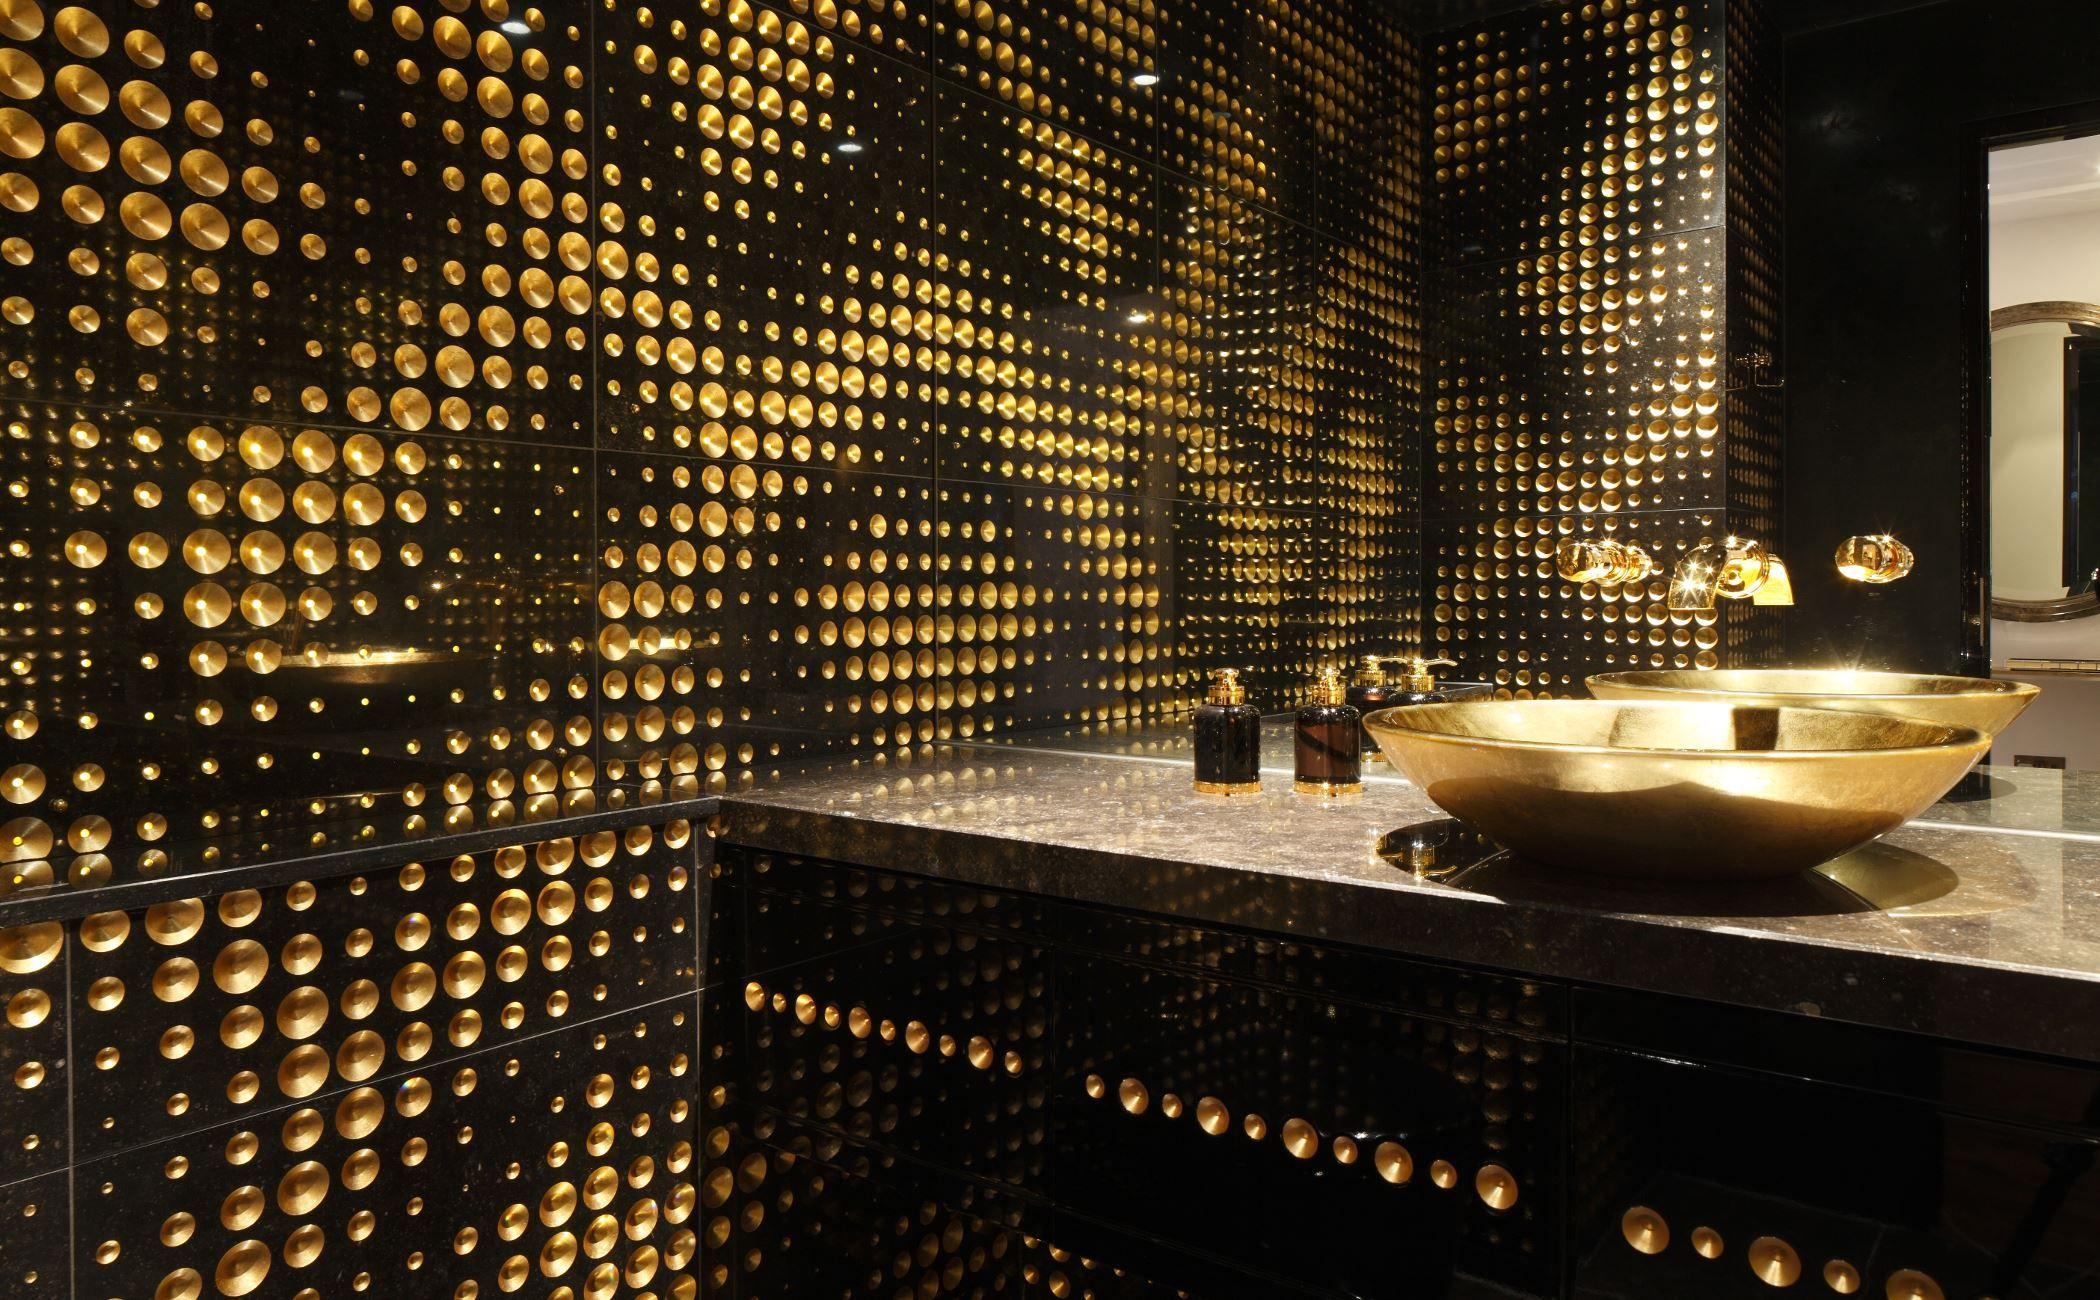 Luxury powder room design - Black marble | Lithos Design | wall ...